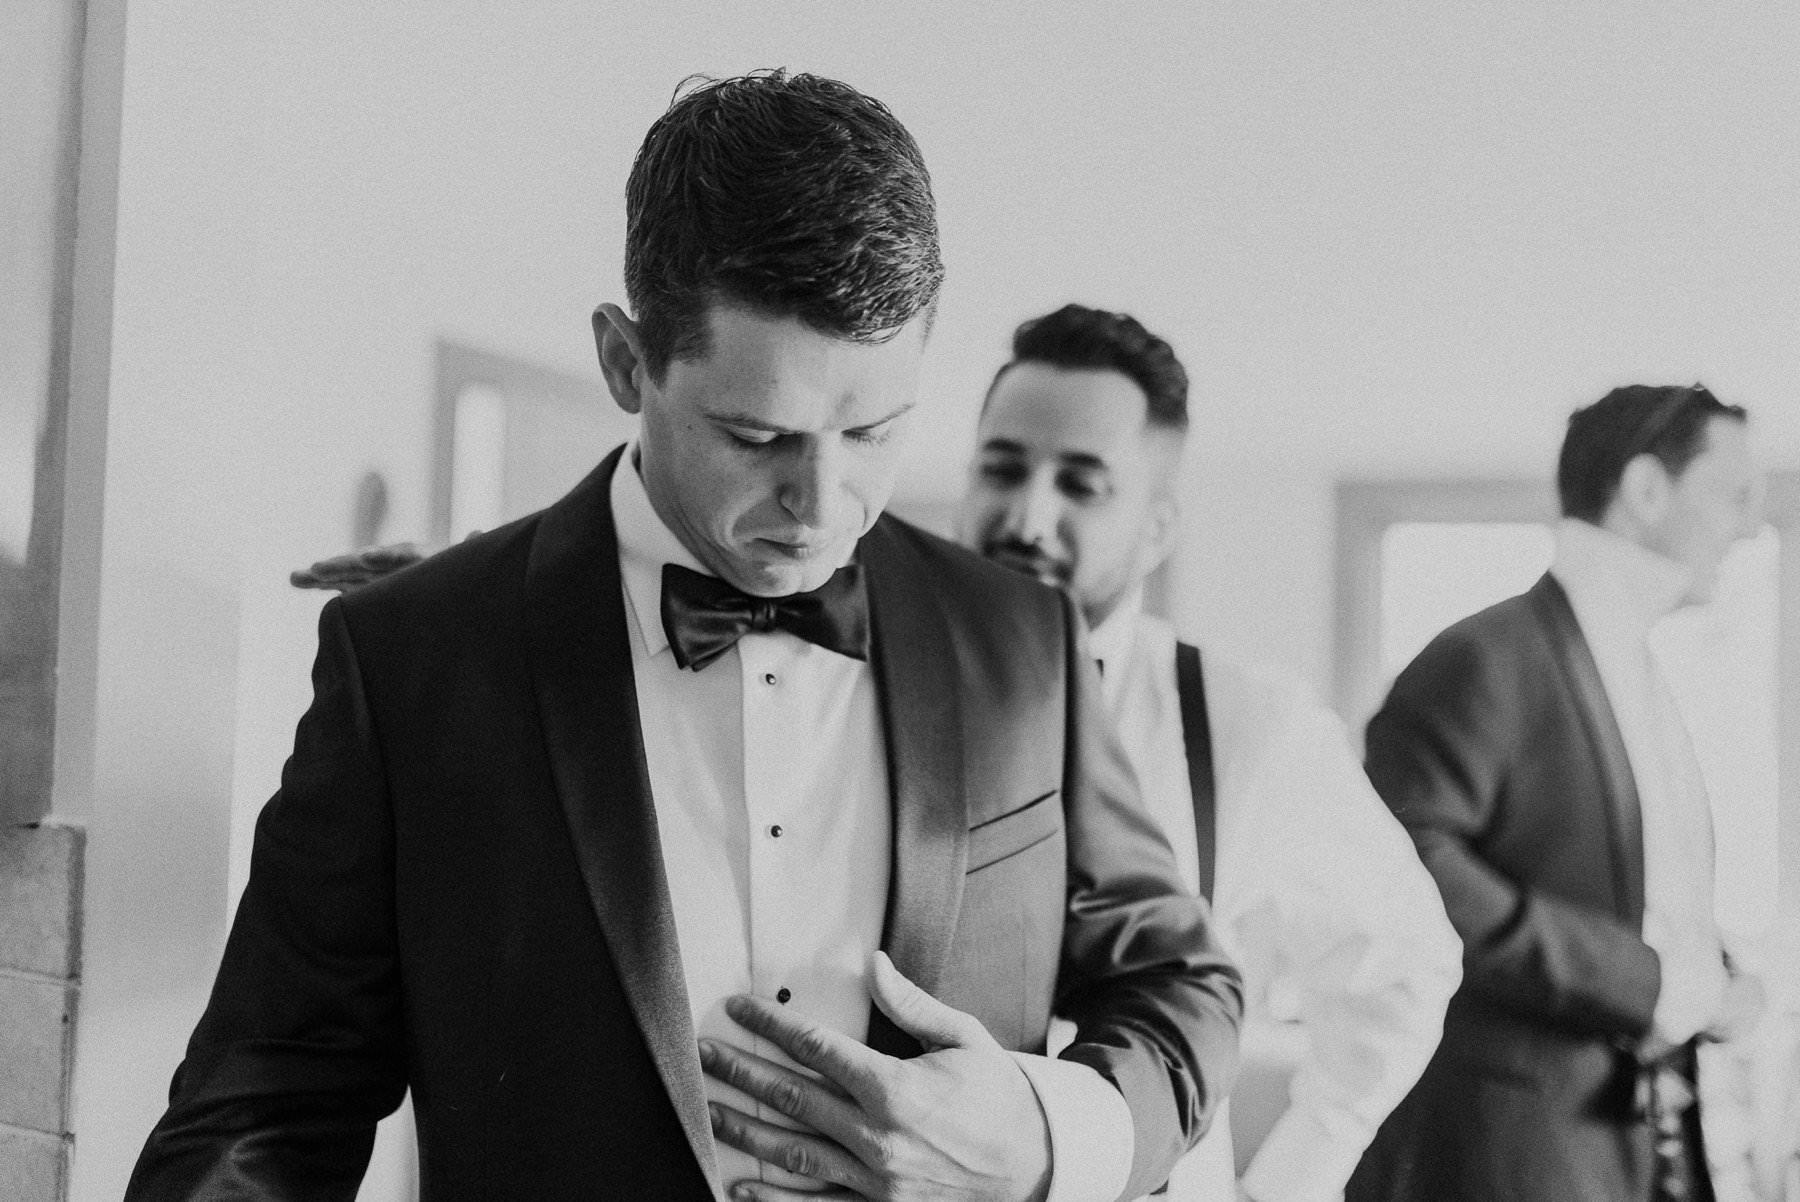 Philadelphia_private_estate_wedding-018.jpg